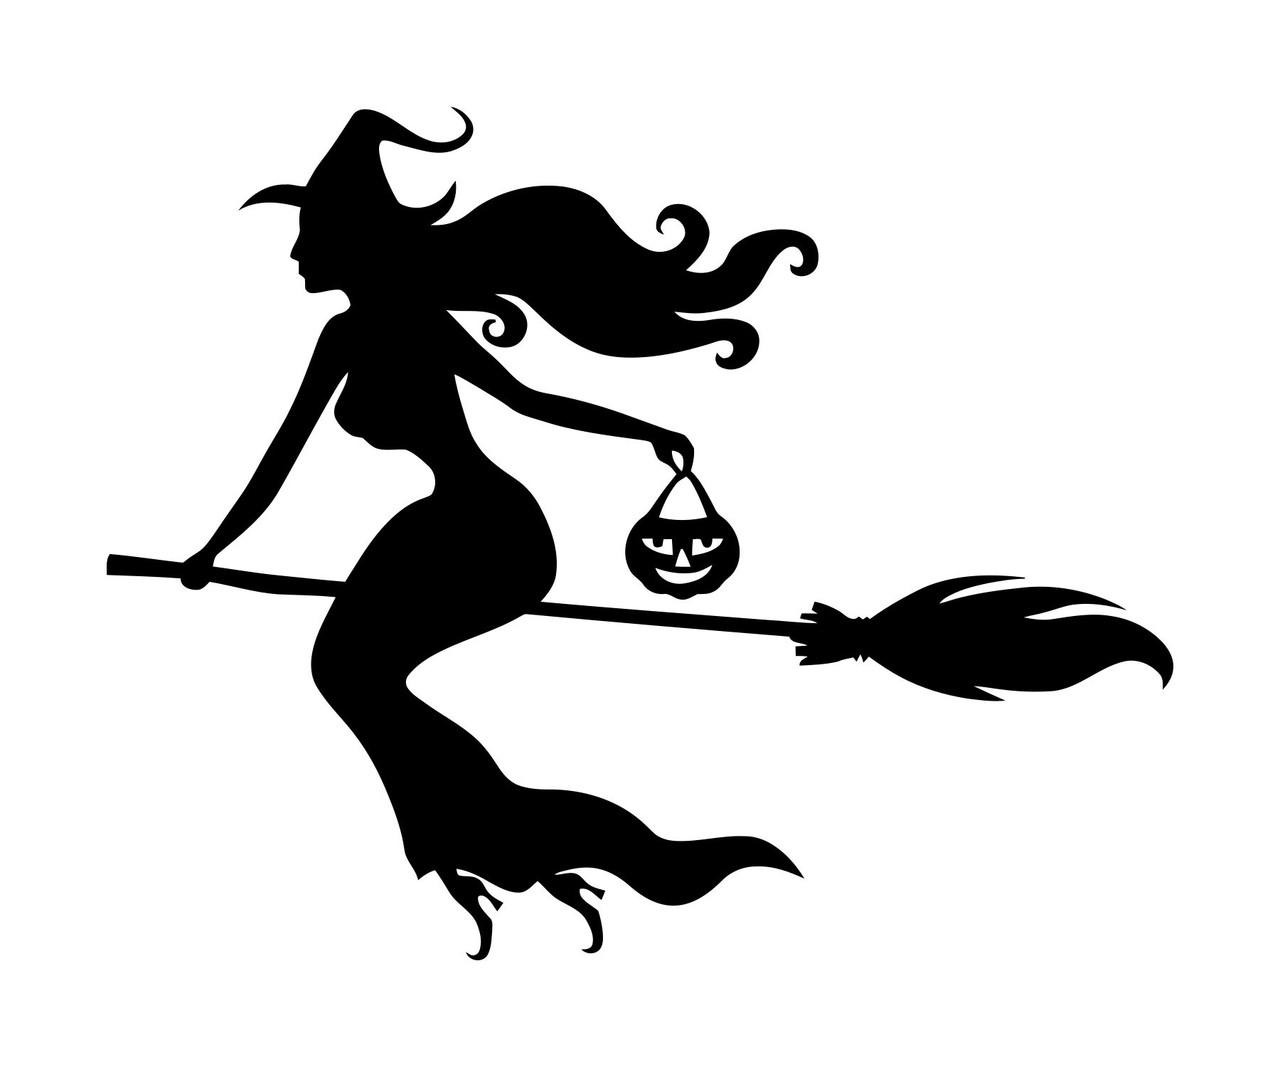 Witch on Broomstick Vinyl Decal Sticker -V6- Flying - Jack o'lantern Halloween